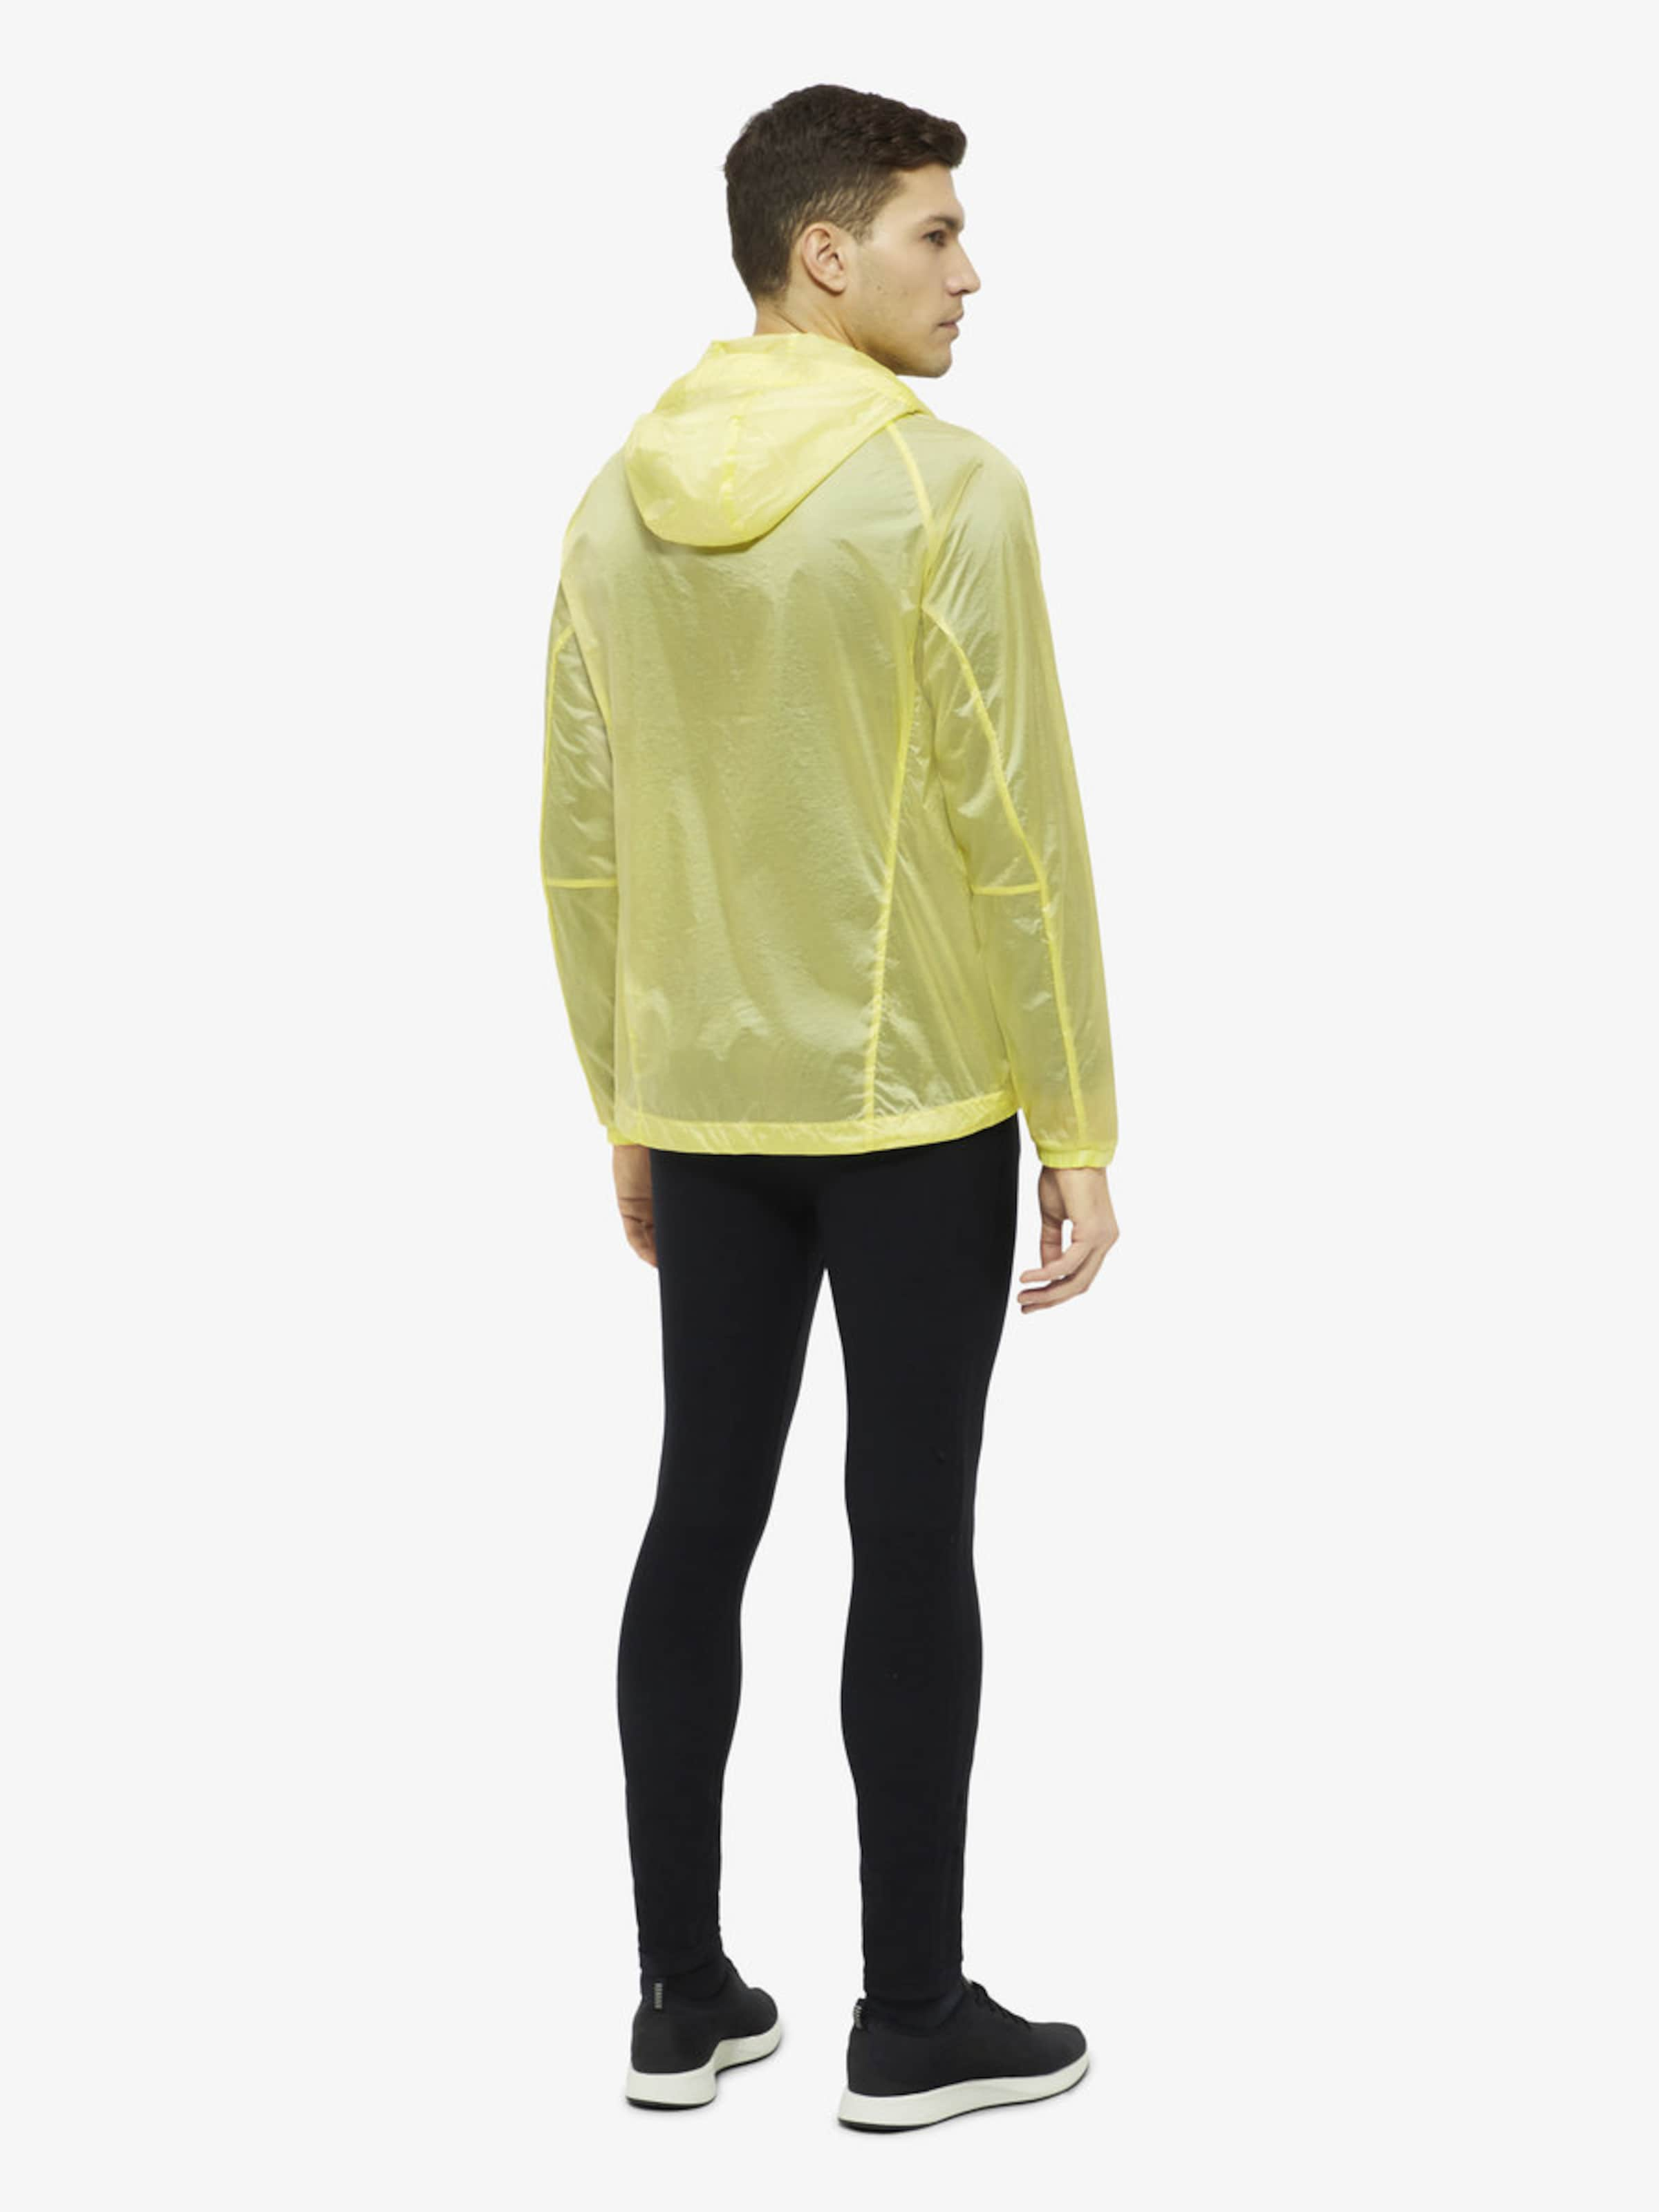 Auslass 100% Garantiert Niedrig Versandkosten J.Lindeberg Jimmy Transparent Nylon Jacke Gut Verkaufen Verkauf Online l8druk